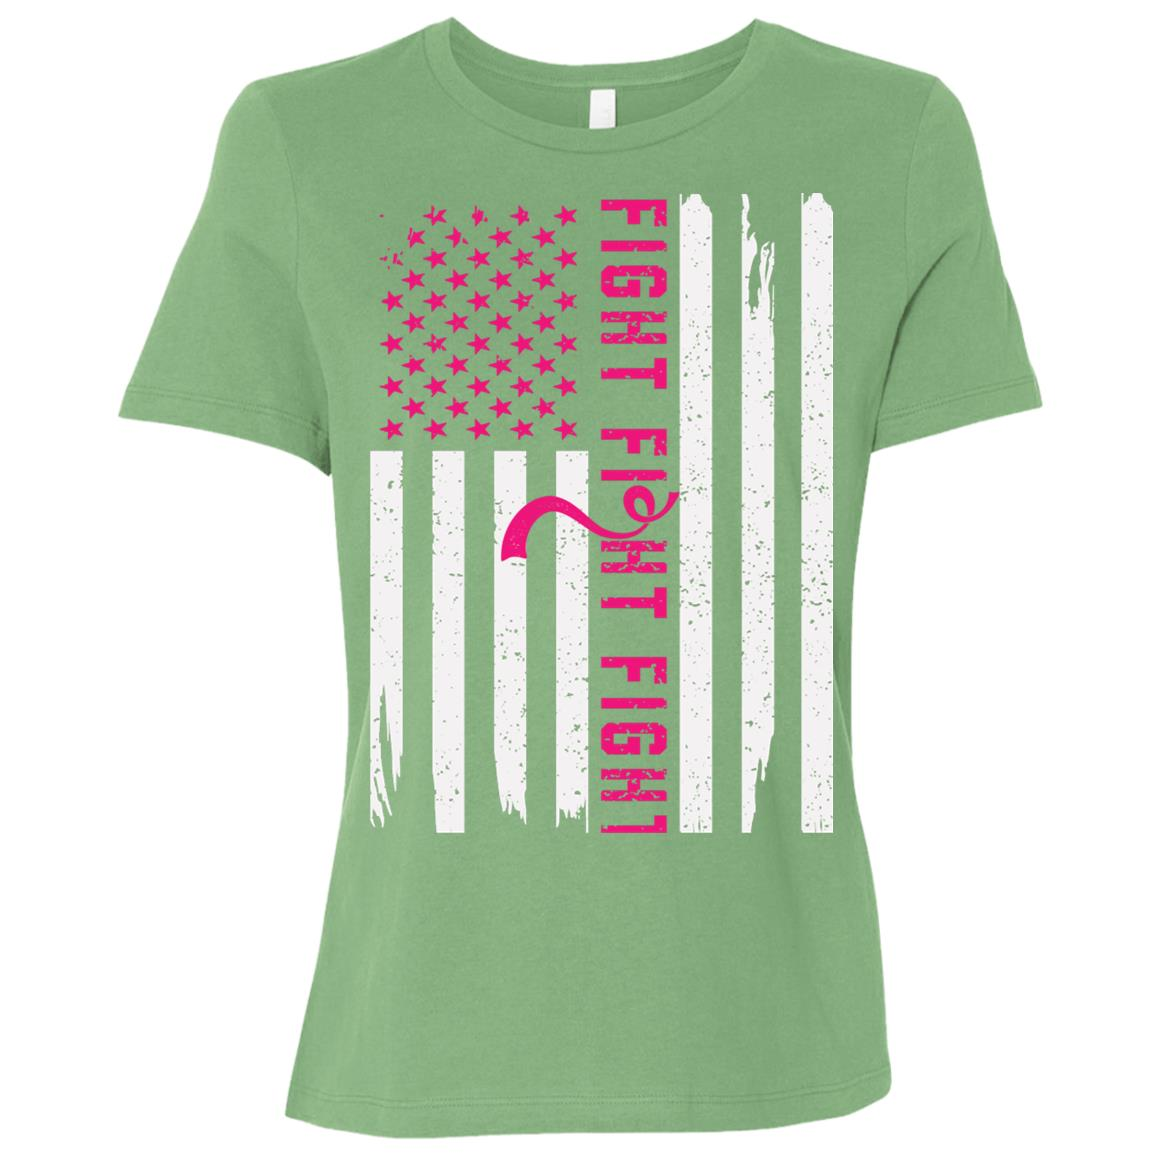 Men's American Flag Breast Cancer Awareness-1 Women Short Sleeve T-Shirt